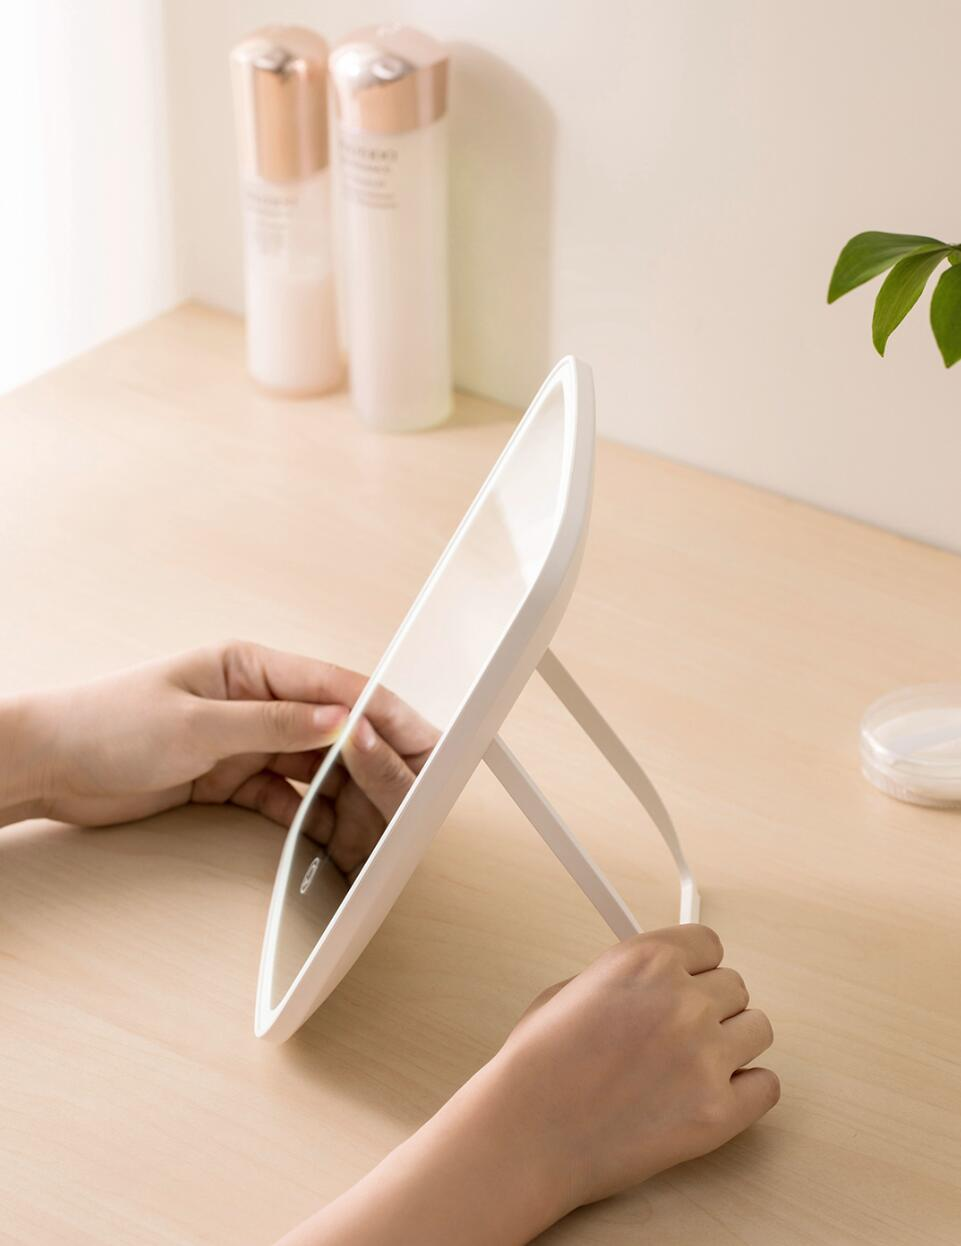 Xiaomi Mijia LED makeup mirror Touch-sensitive control LED natural light fill adjustable angle Brightness lights long battery li (7)